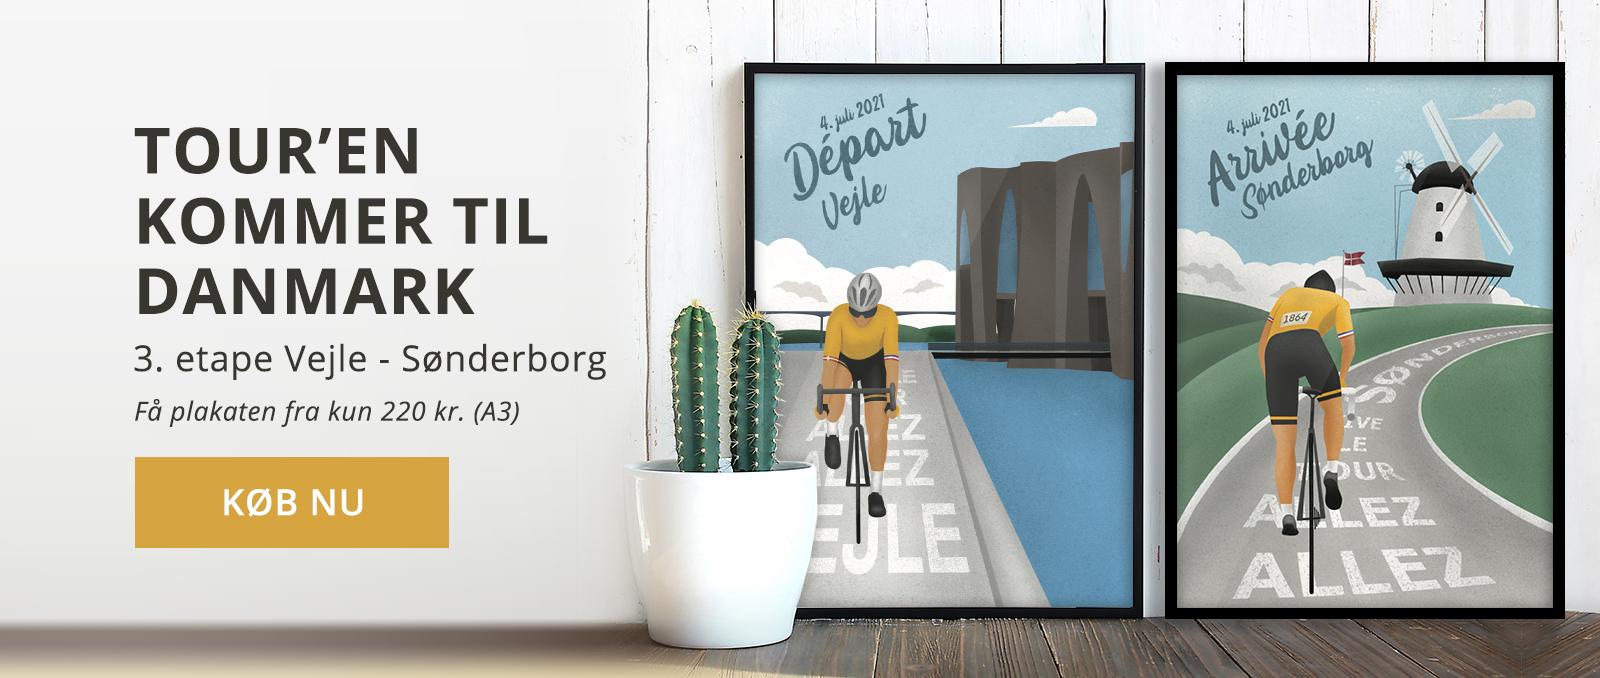 tour_de_france_callmevector_vejle_soenderborg_poster